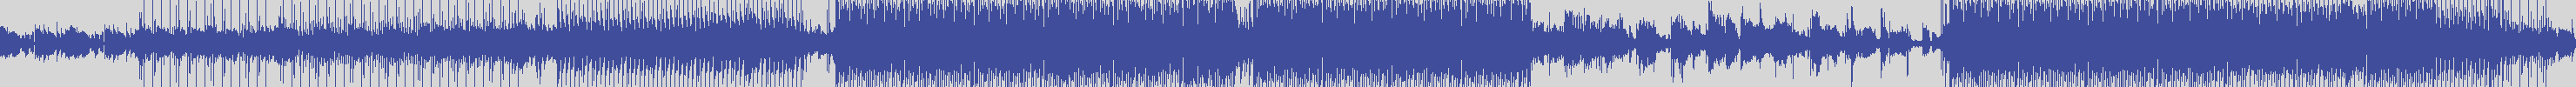 worldwide_music_records [WMR002] Save As - Got the Blue [Original Mix] audio wave form